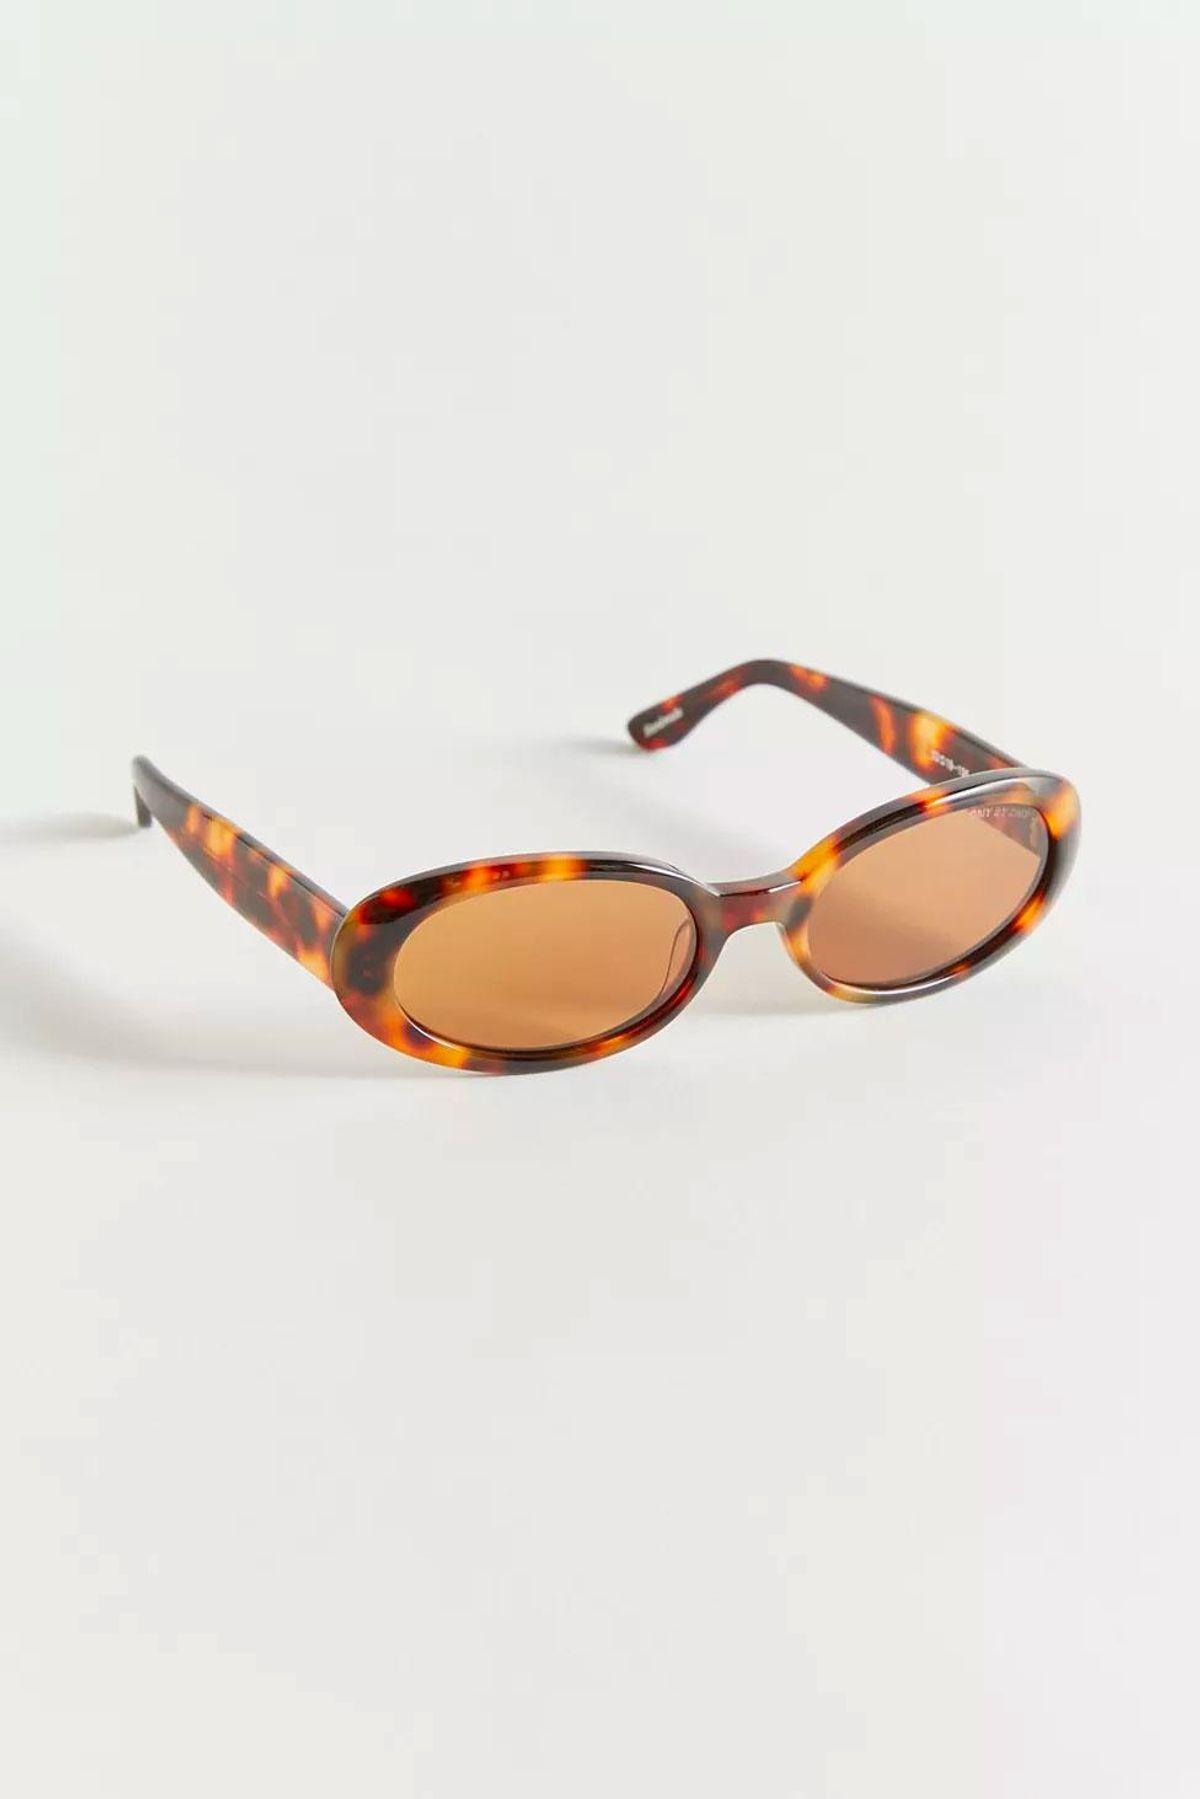 dmy by dmy valentina oval sunglasses